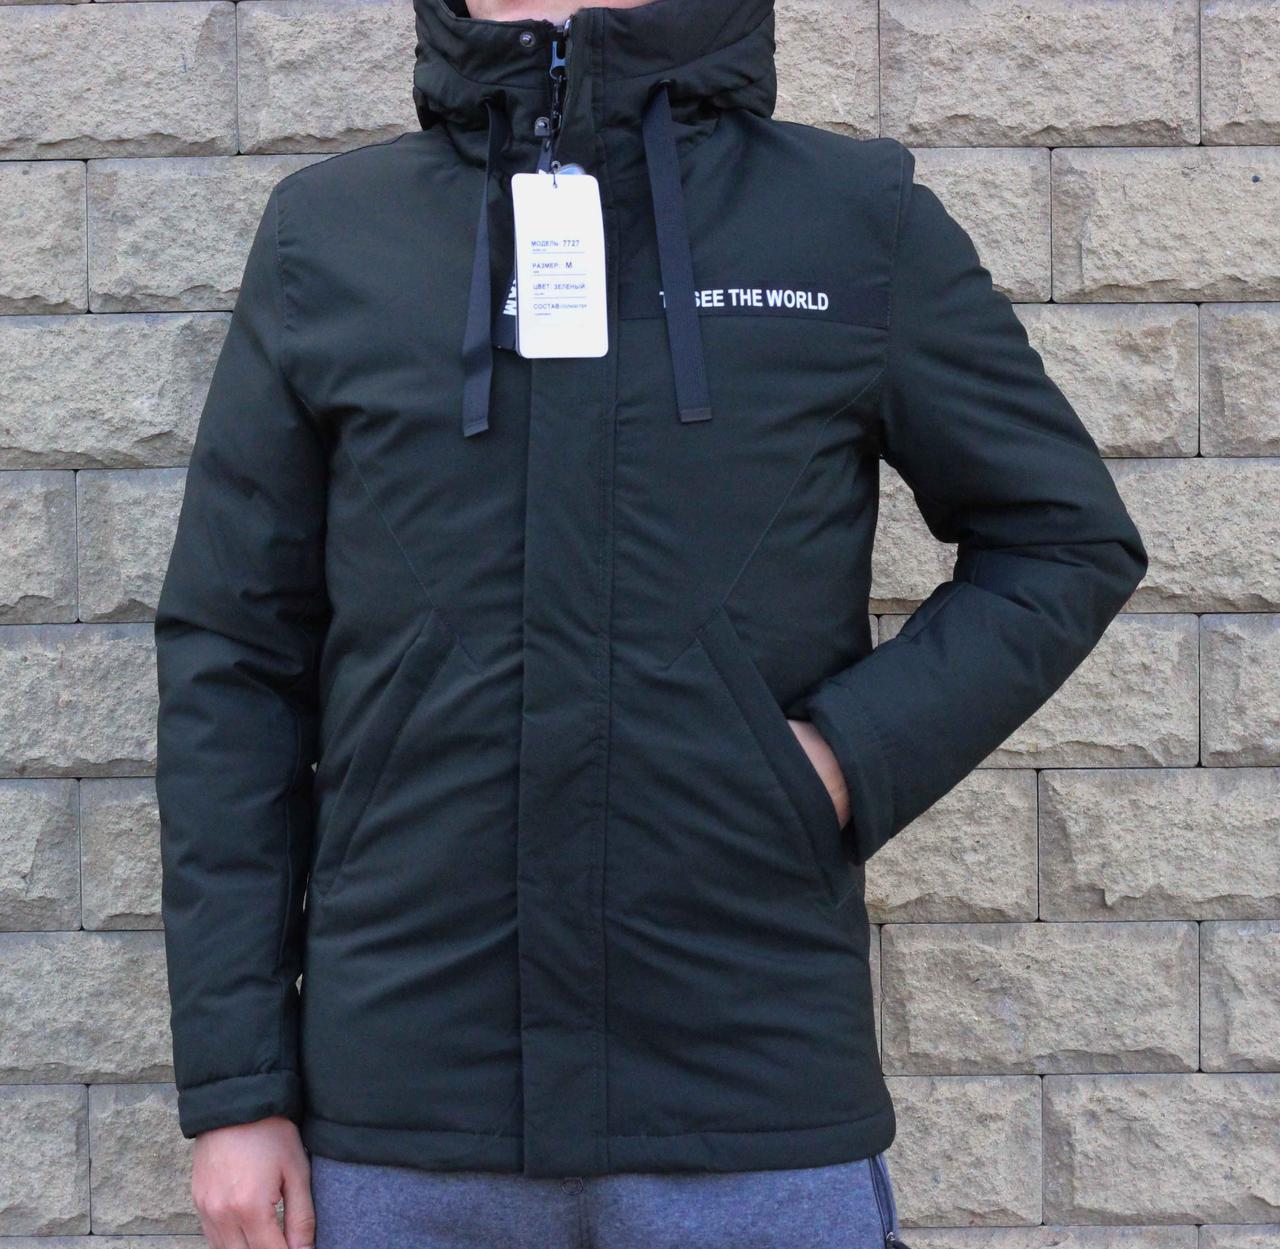 Мужская зимняя куртка хаки Remain с капюшоном 50 размер